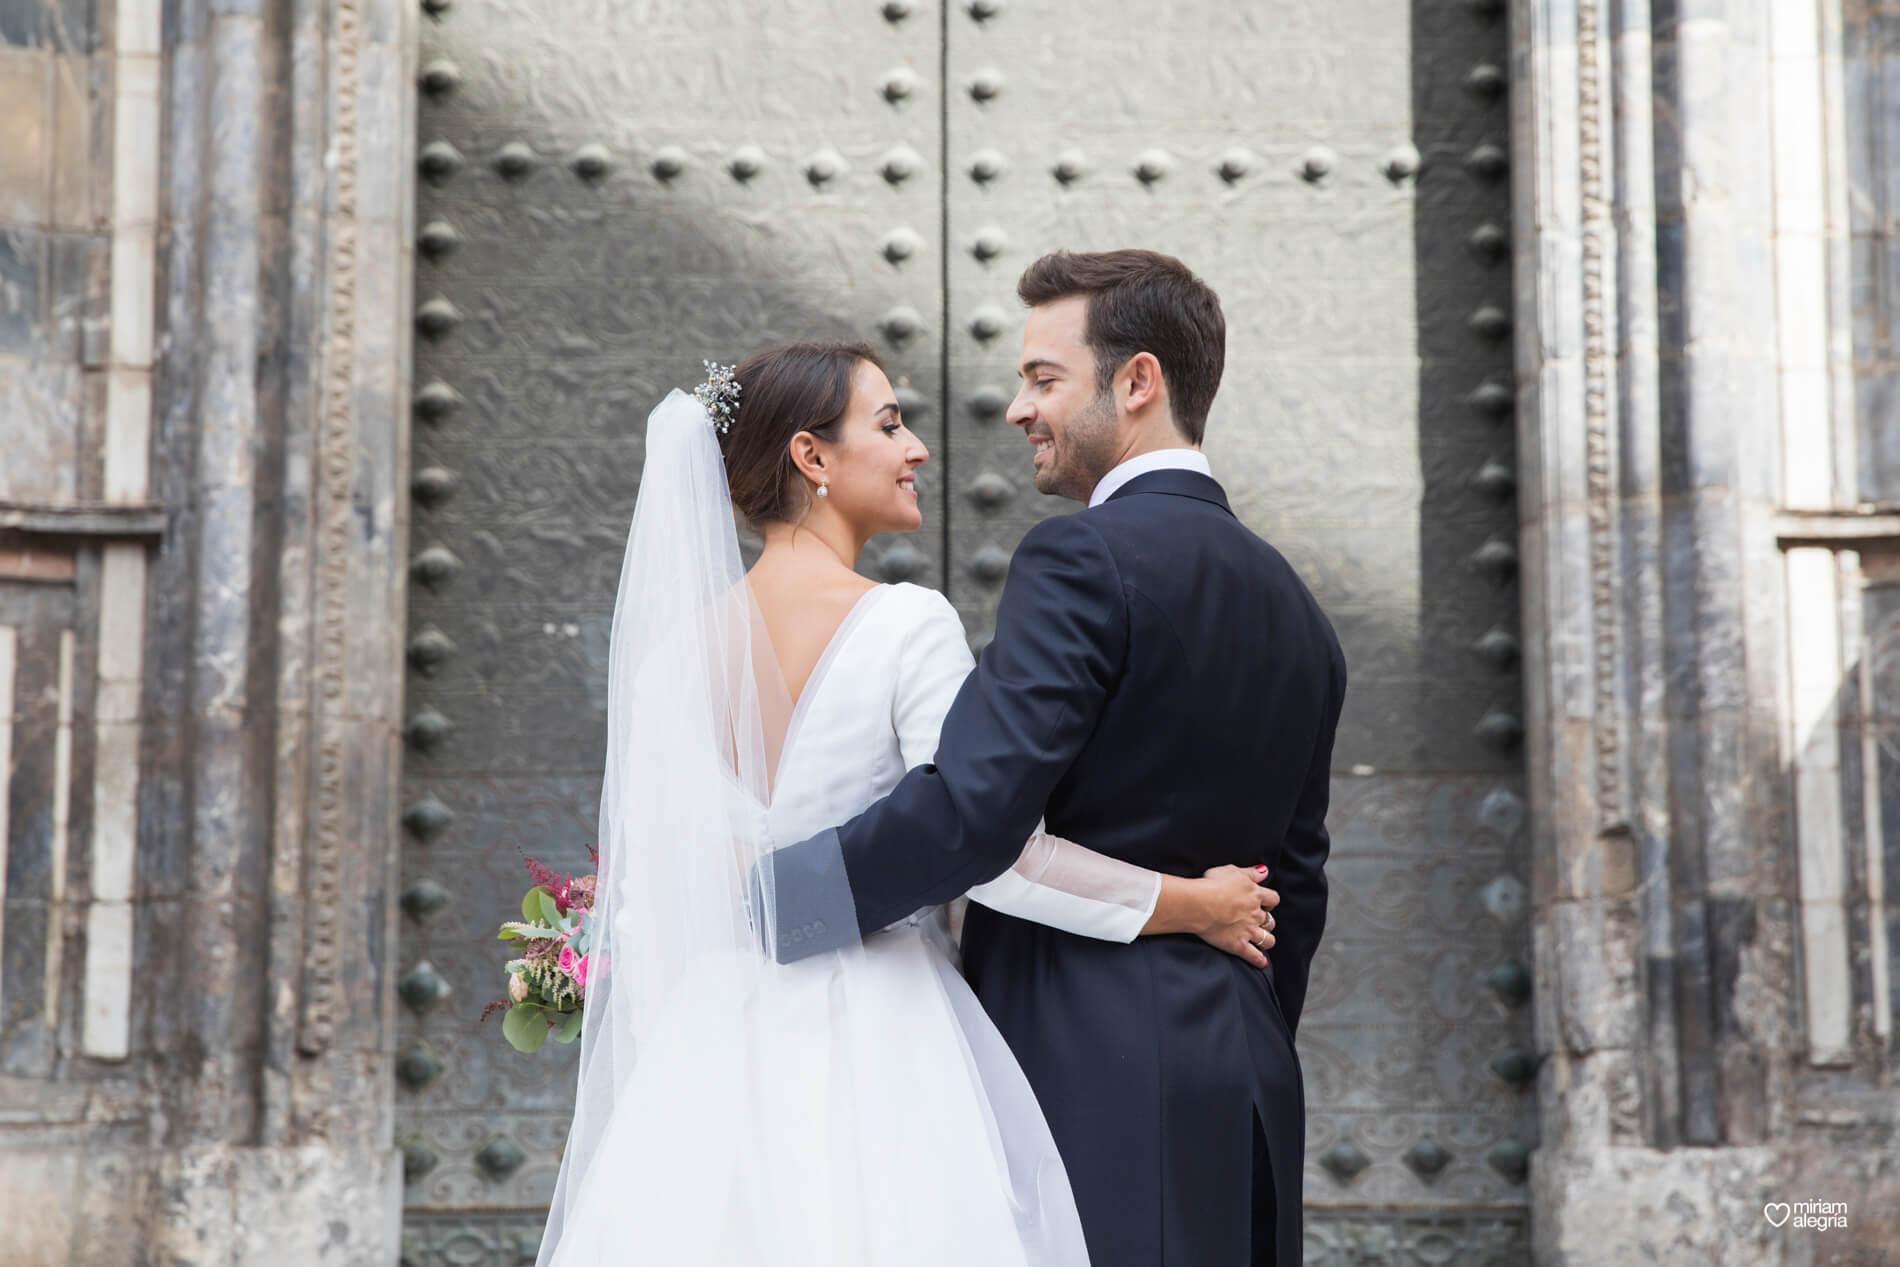 vestido-de-novia-paula-del-vas-miriam-alegria-fotografos-boda-murcia-89